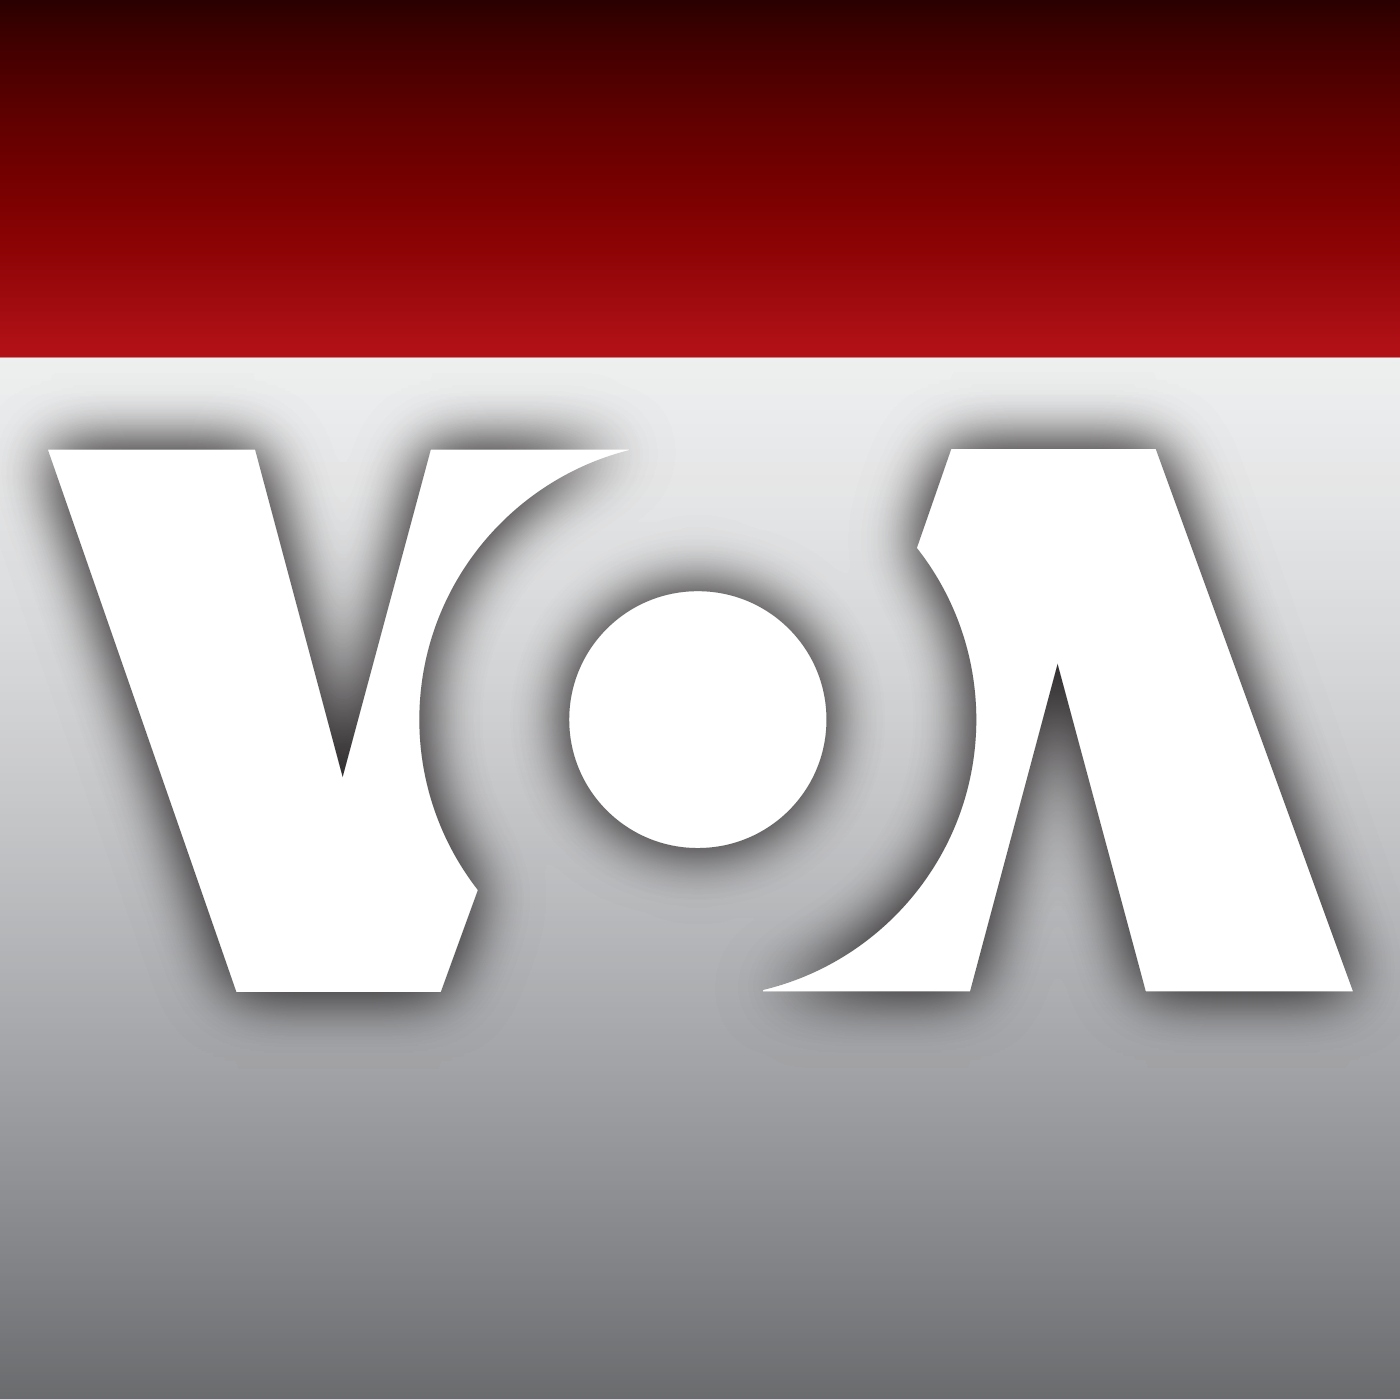 Dusangire Ijambo - 0400 UTC - Voice of America